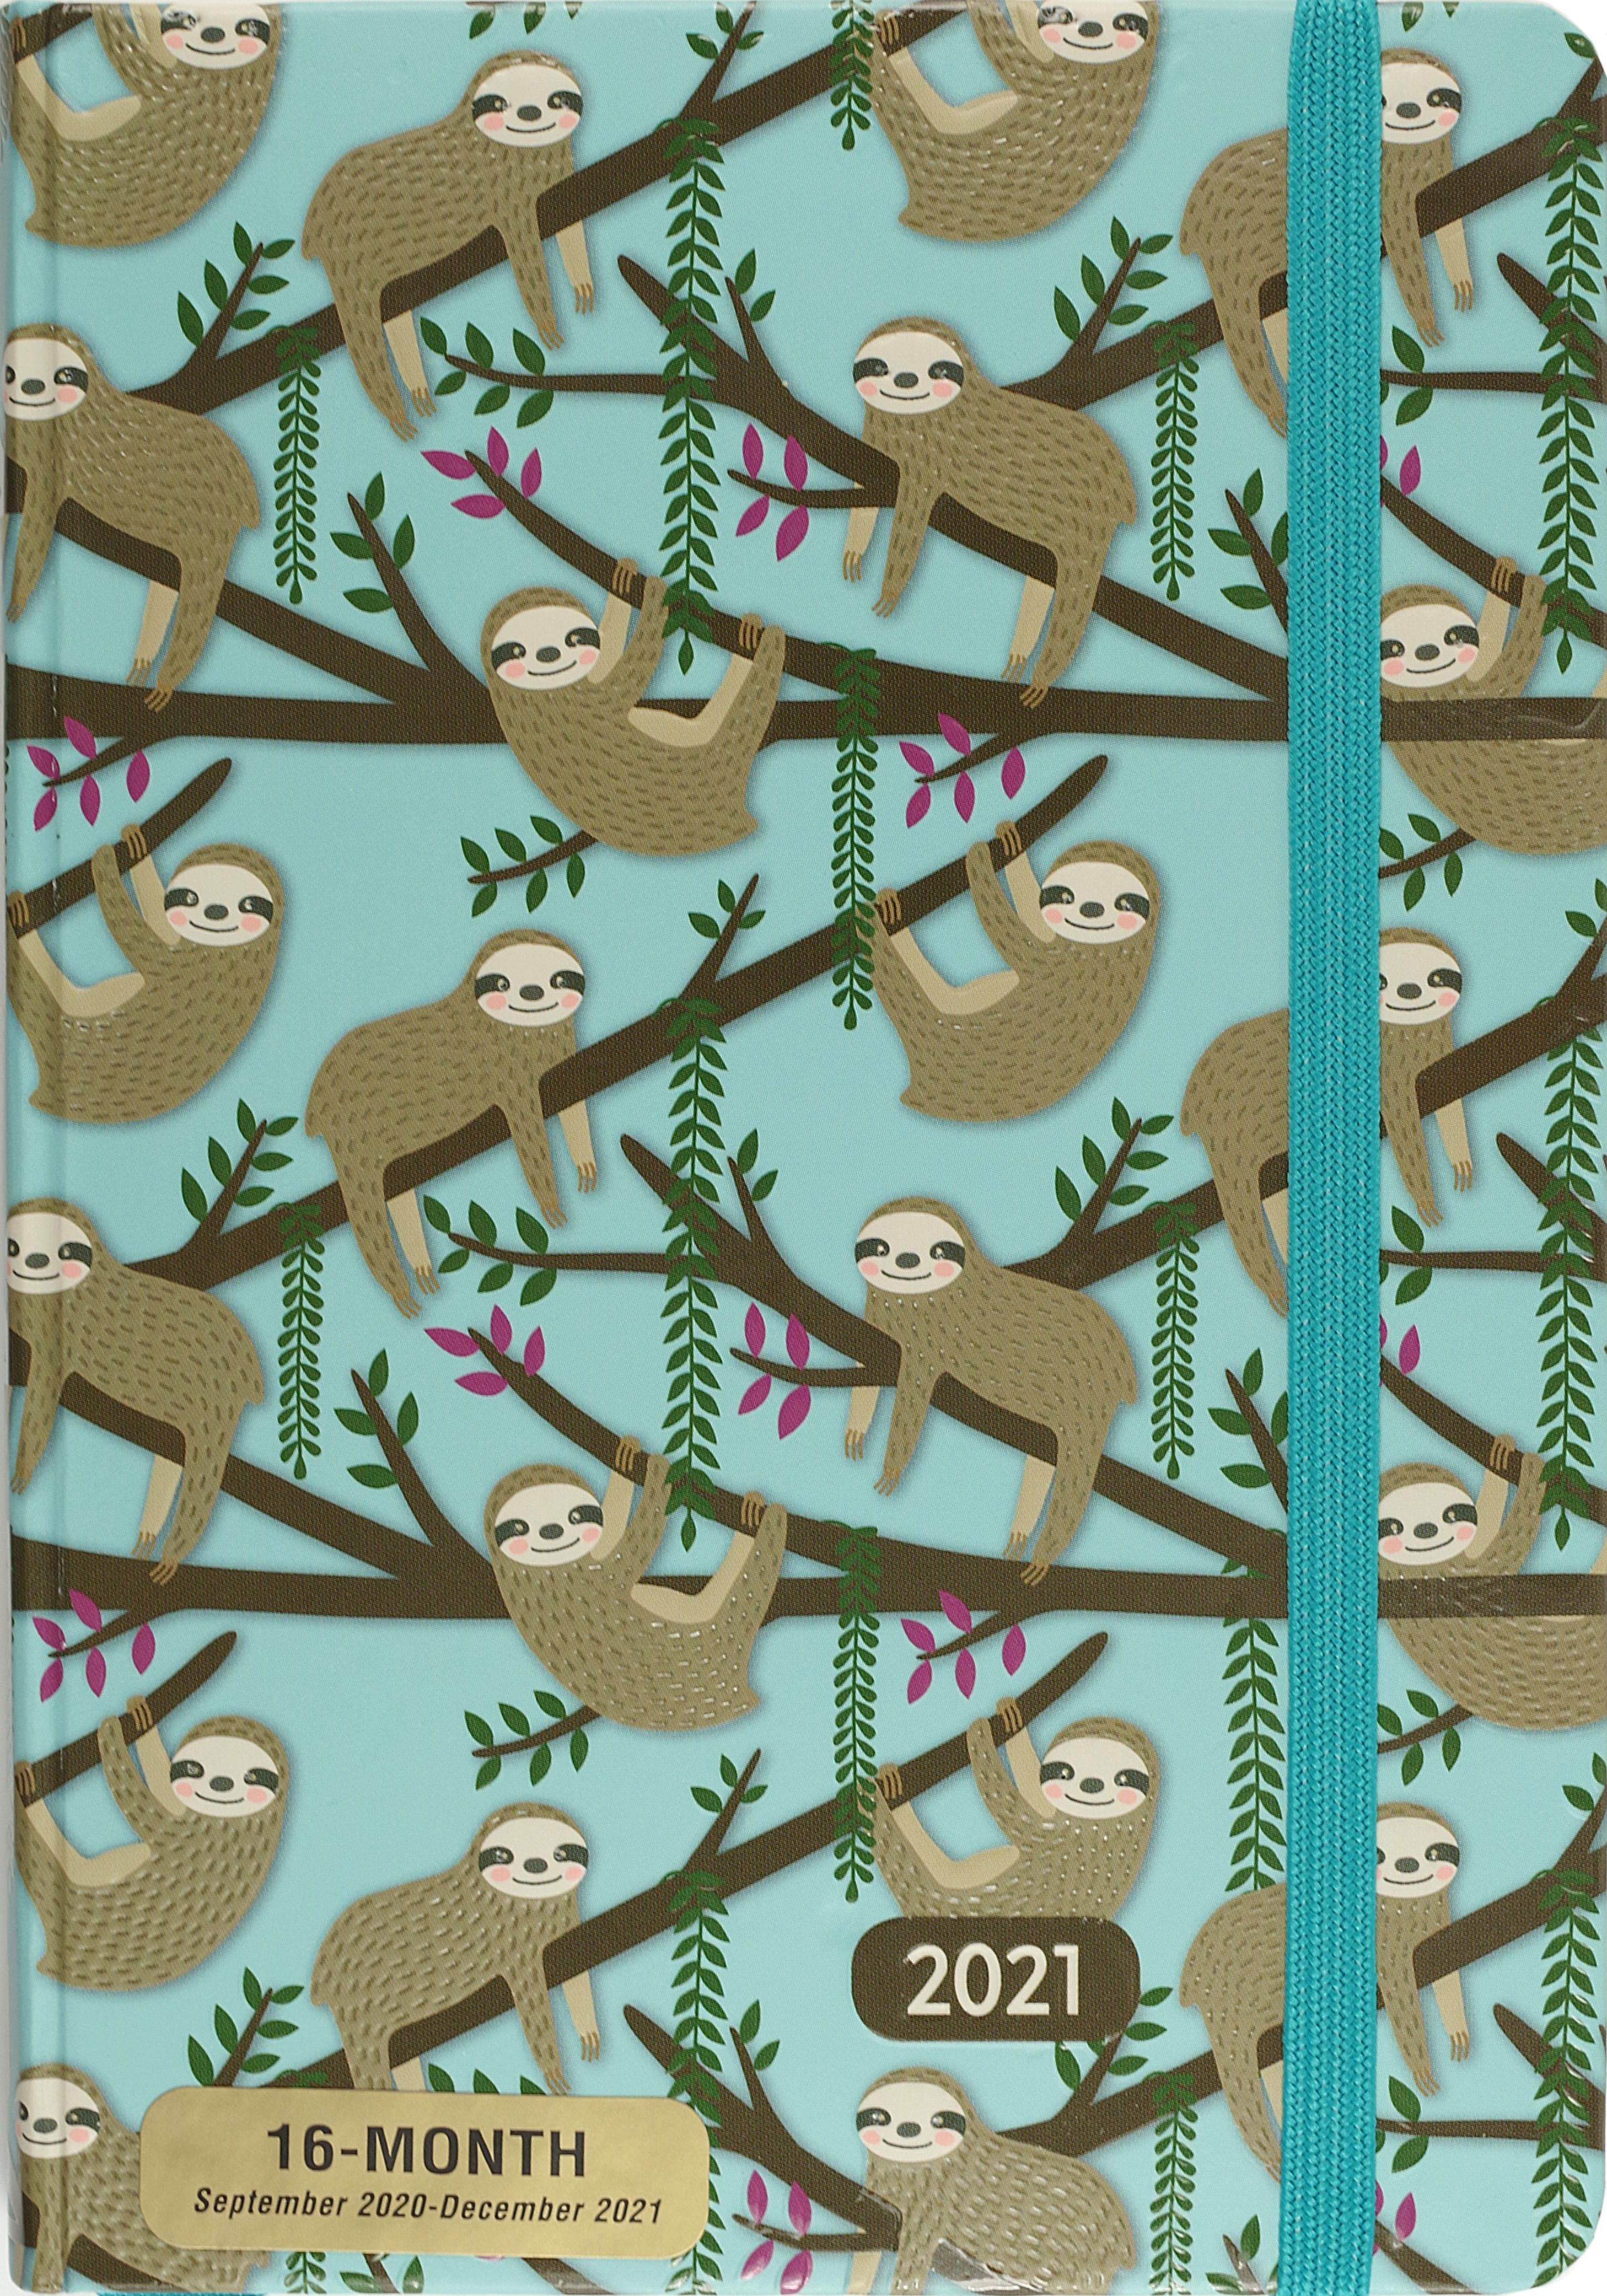 2021 Sloths 16-Month Planner